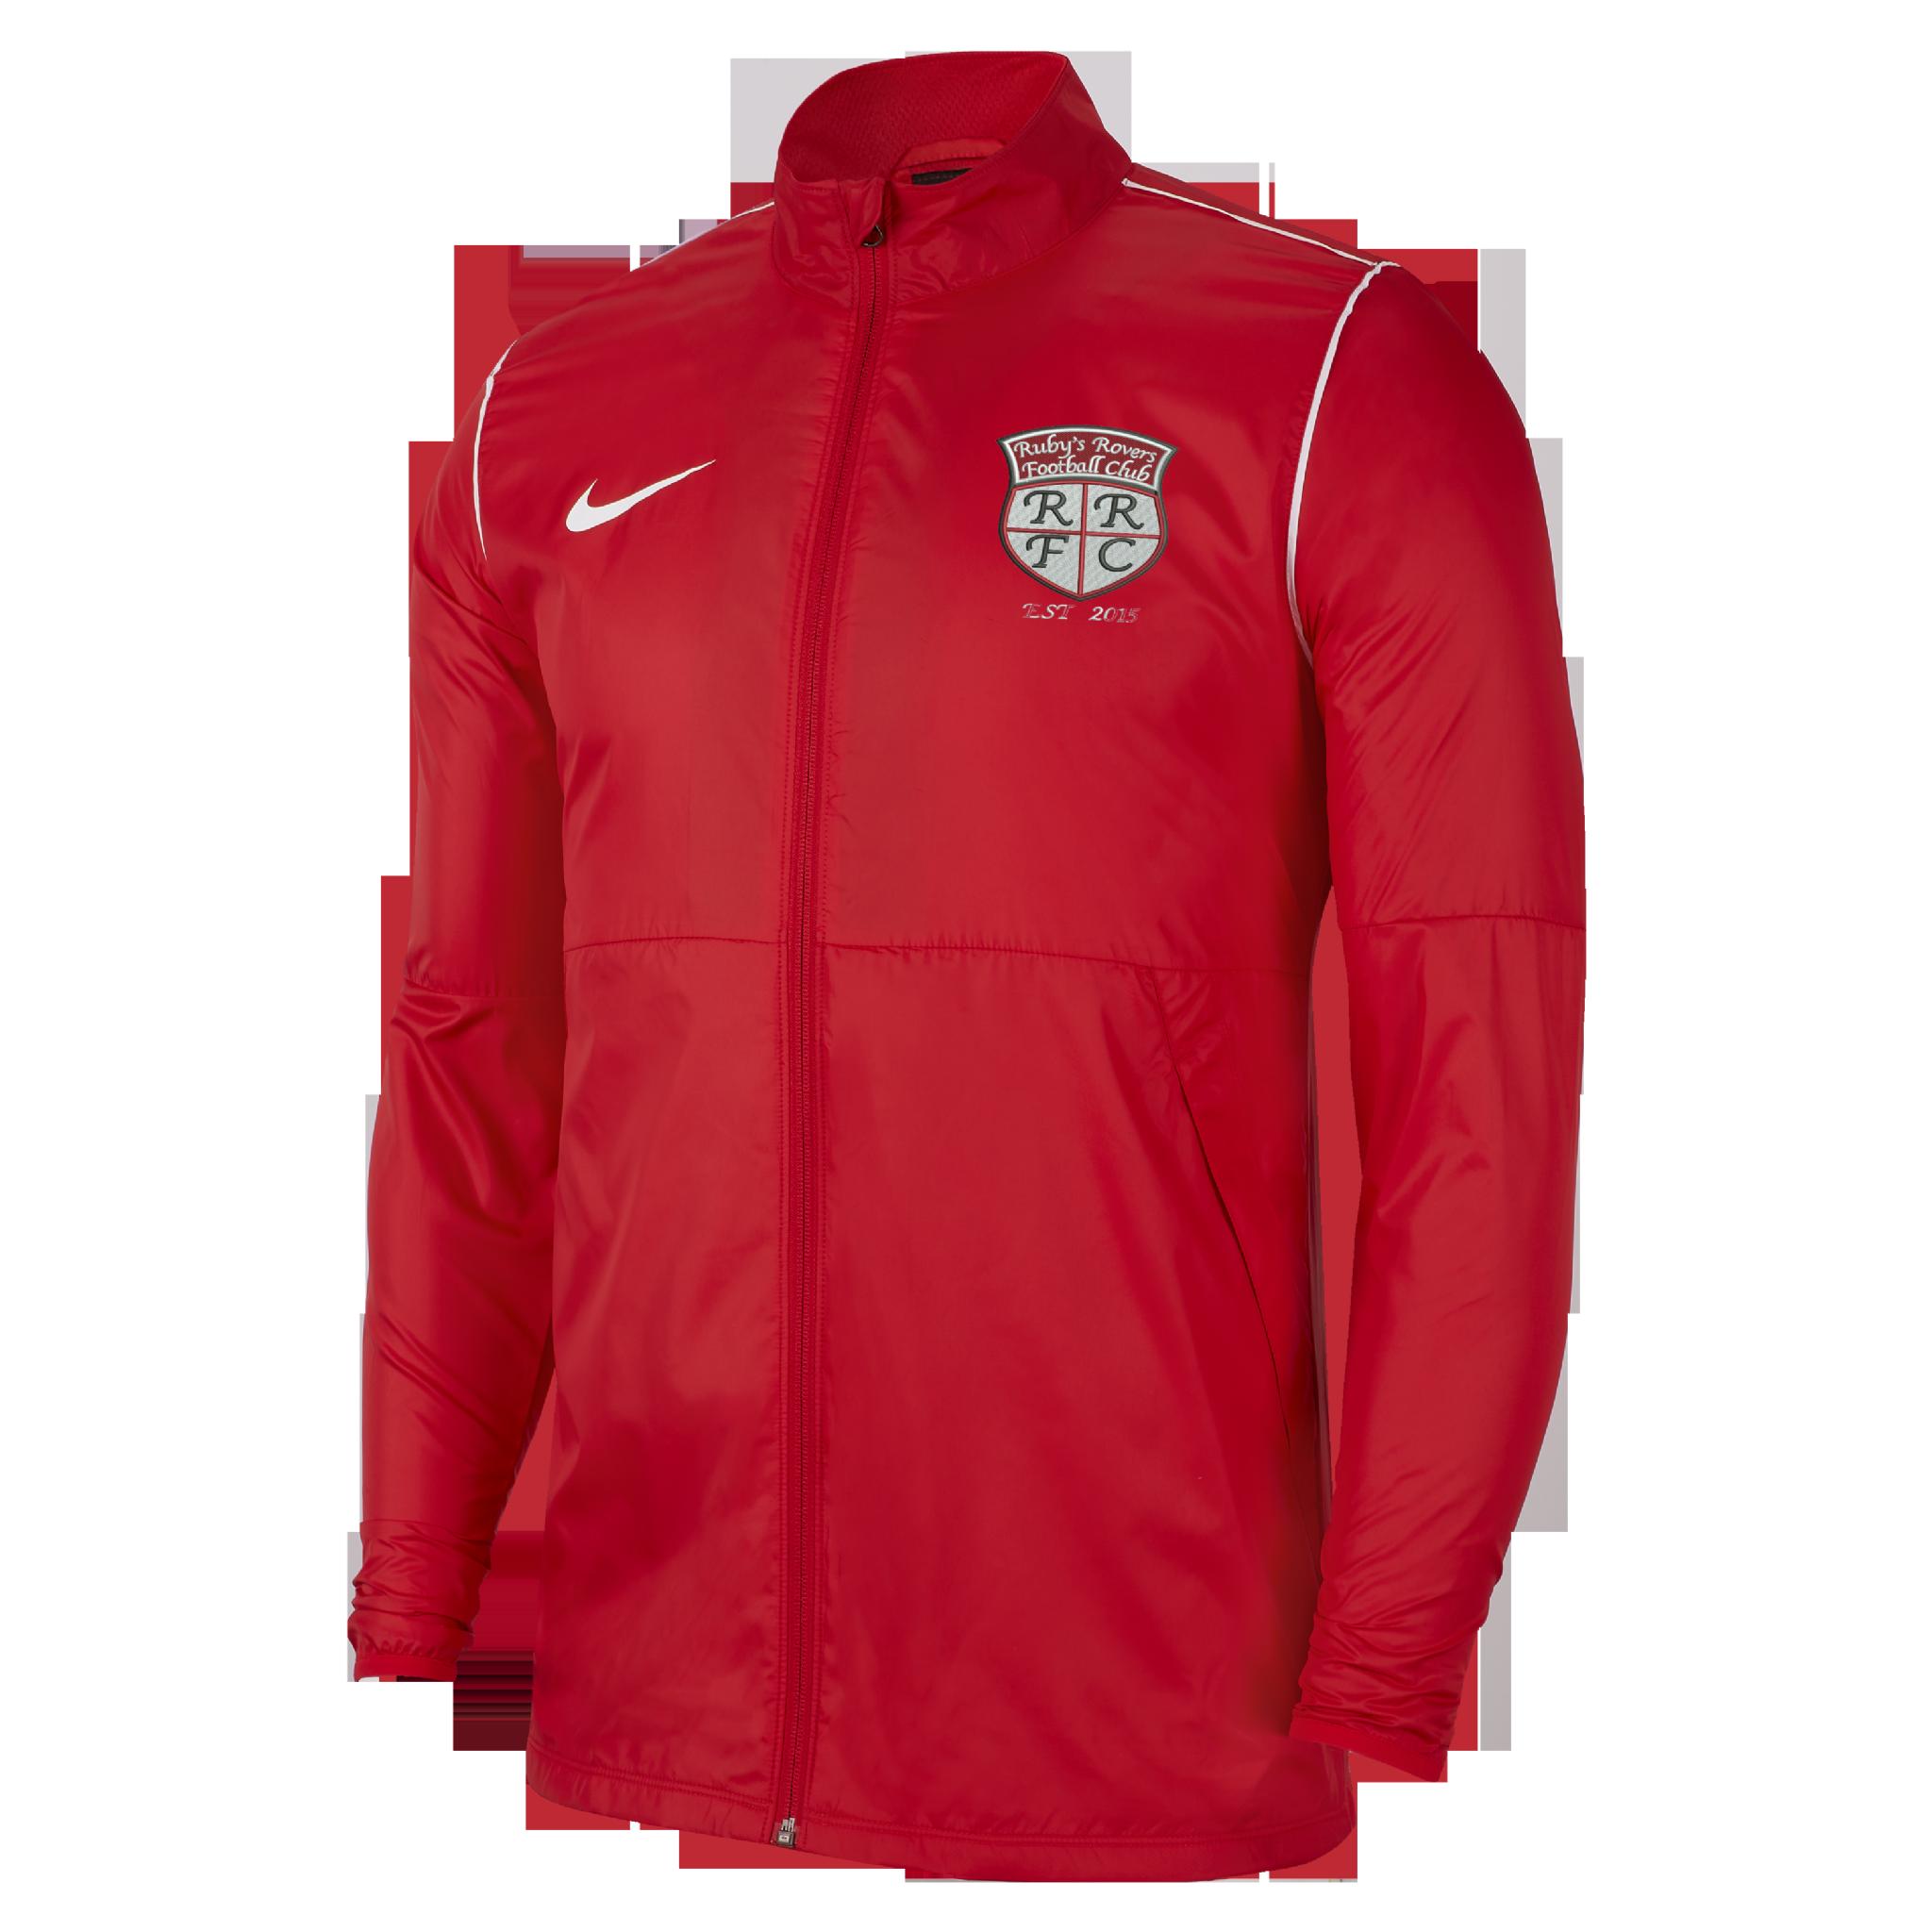 rubys rovers park rain jacket 37182 1 p